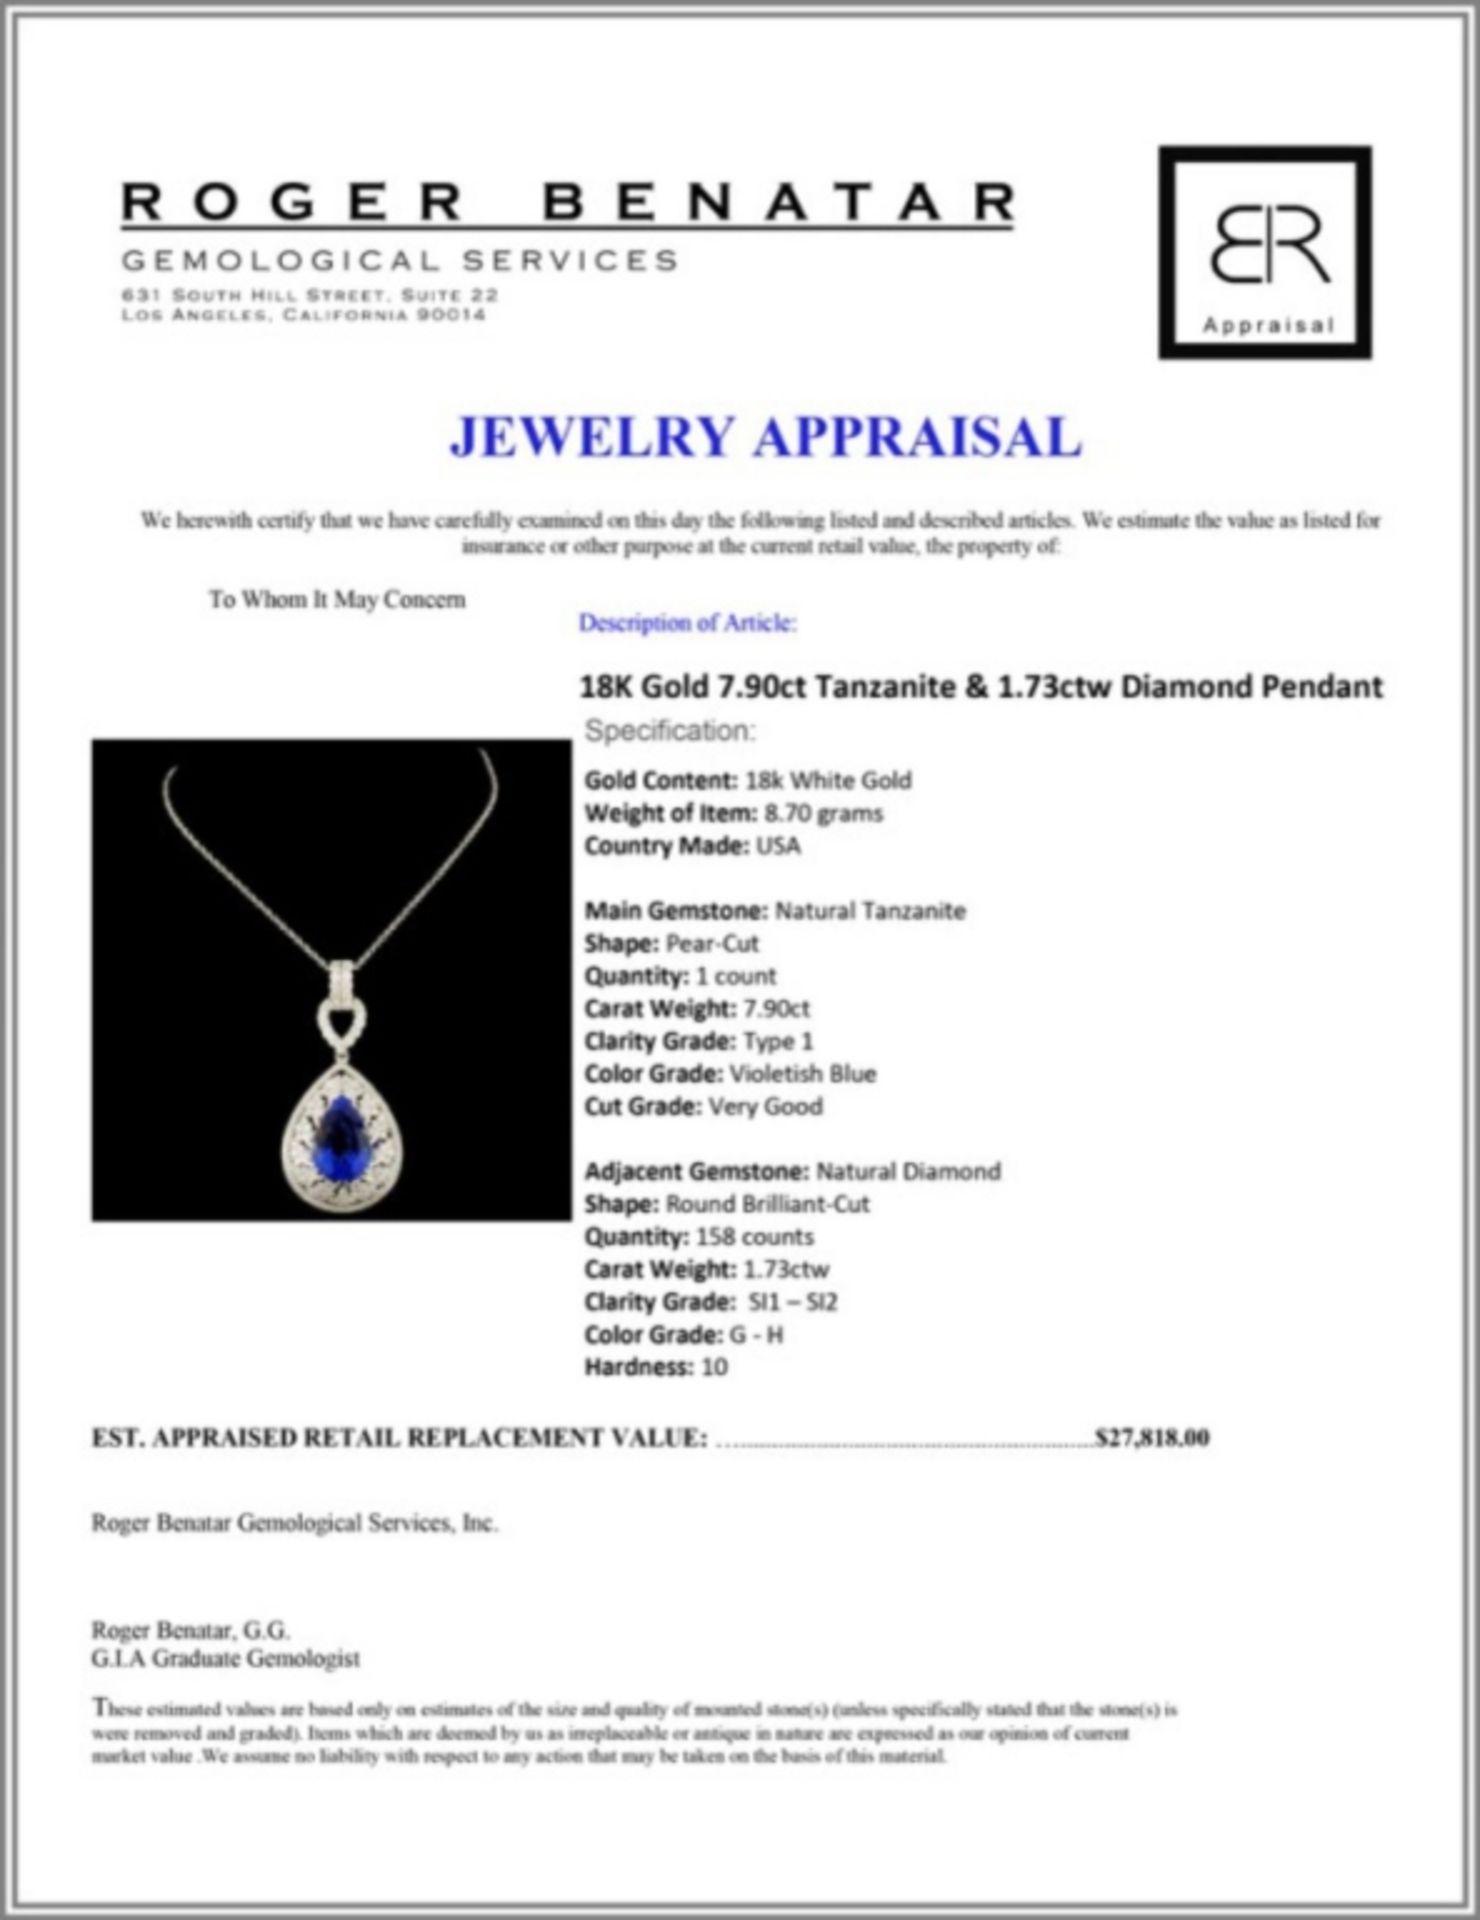 18K Gold 7.90ct Tanzanite & 1.73ctw Diamond Pendan - Image 4 of 4